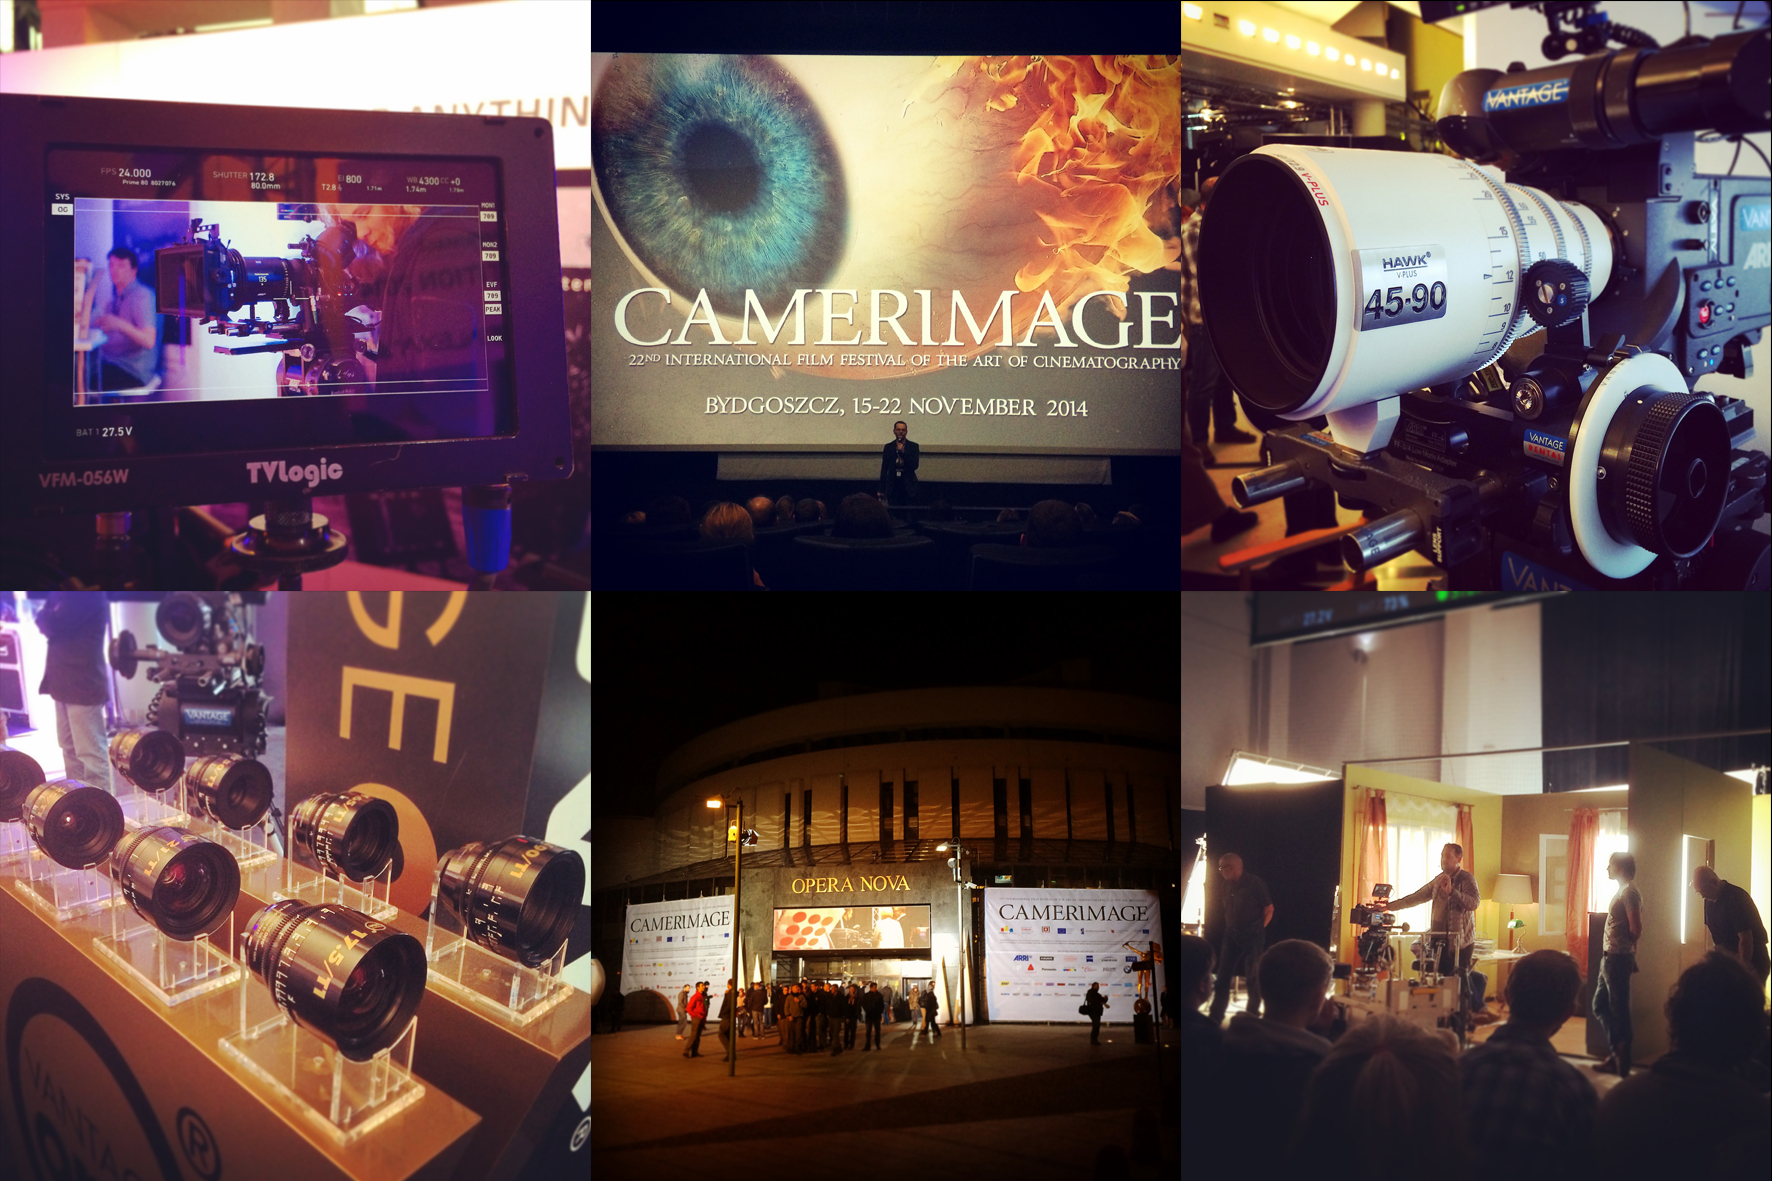 Camerimage 1